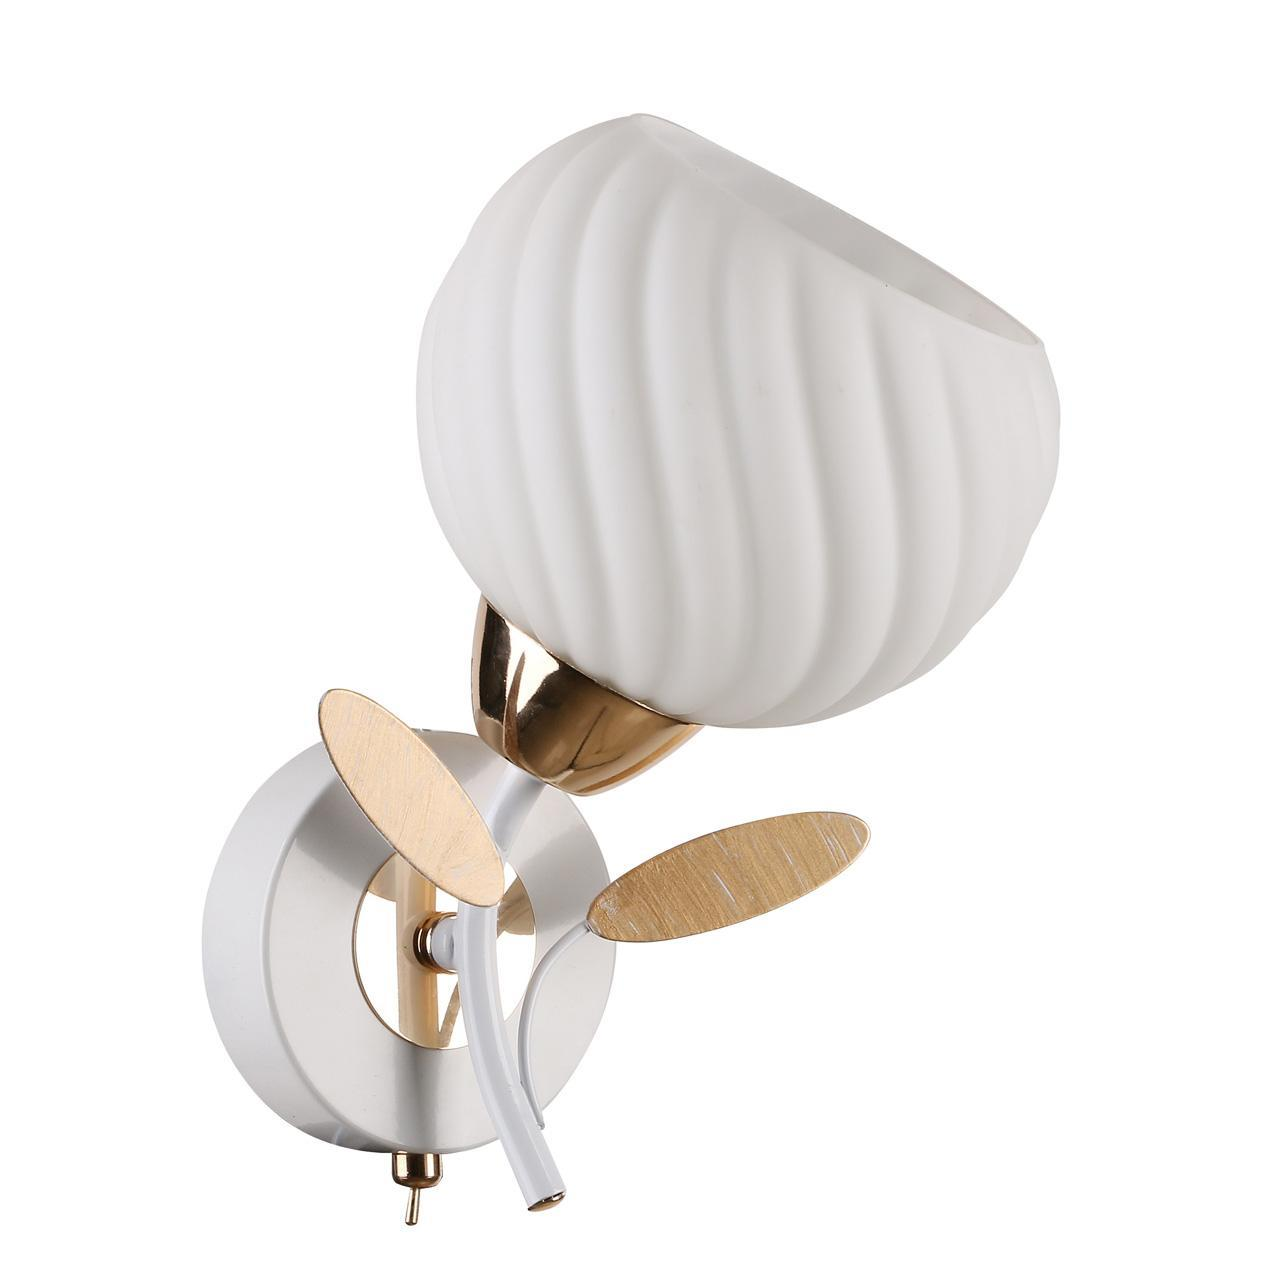 Бра IDLamp Filomena 821/1A-Whitegold вам свет бра idlamp annelisa 380 1a whitegold